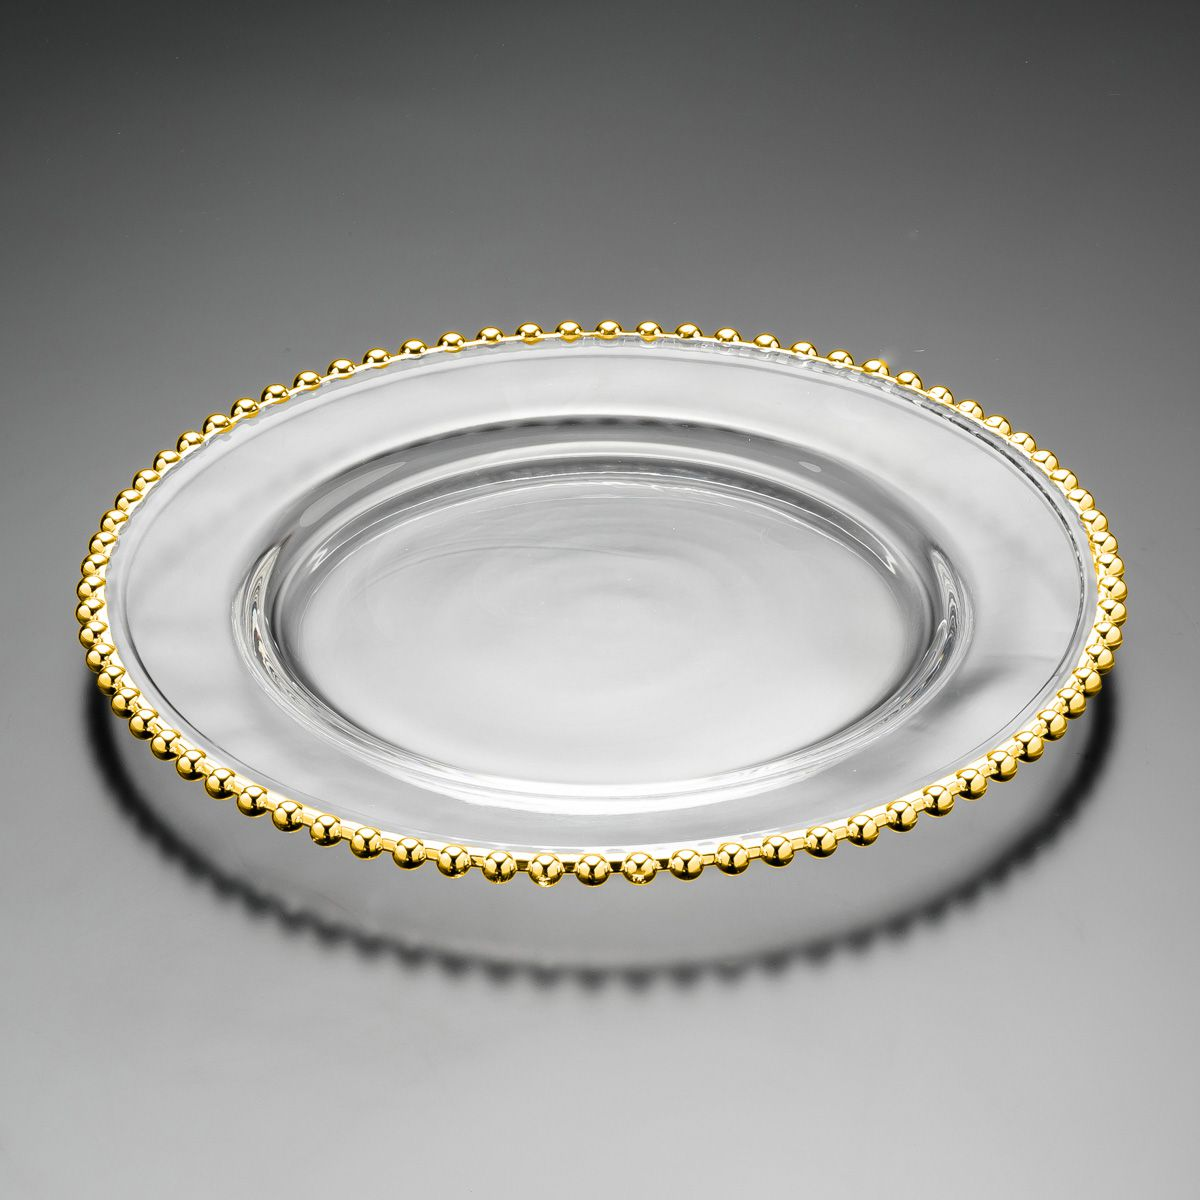 Sousplat 31,5 cm de cristal transparente com borda dourada Pearl Wolff - 2986